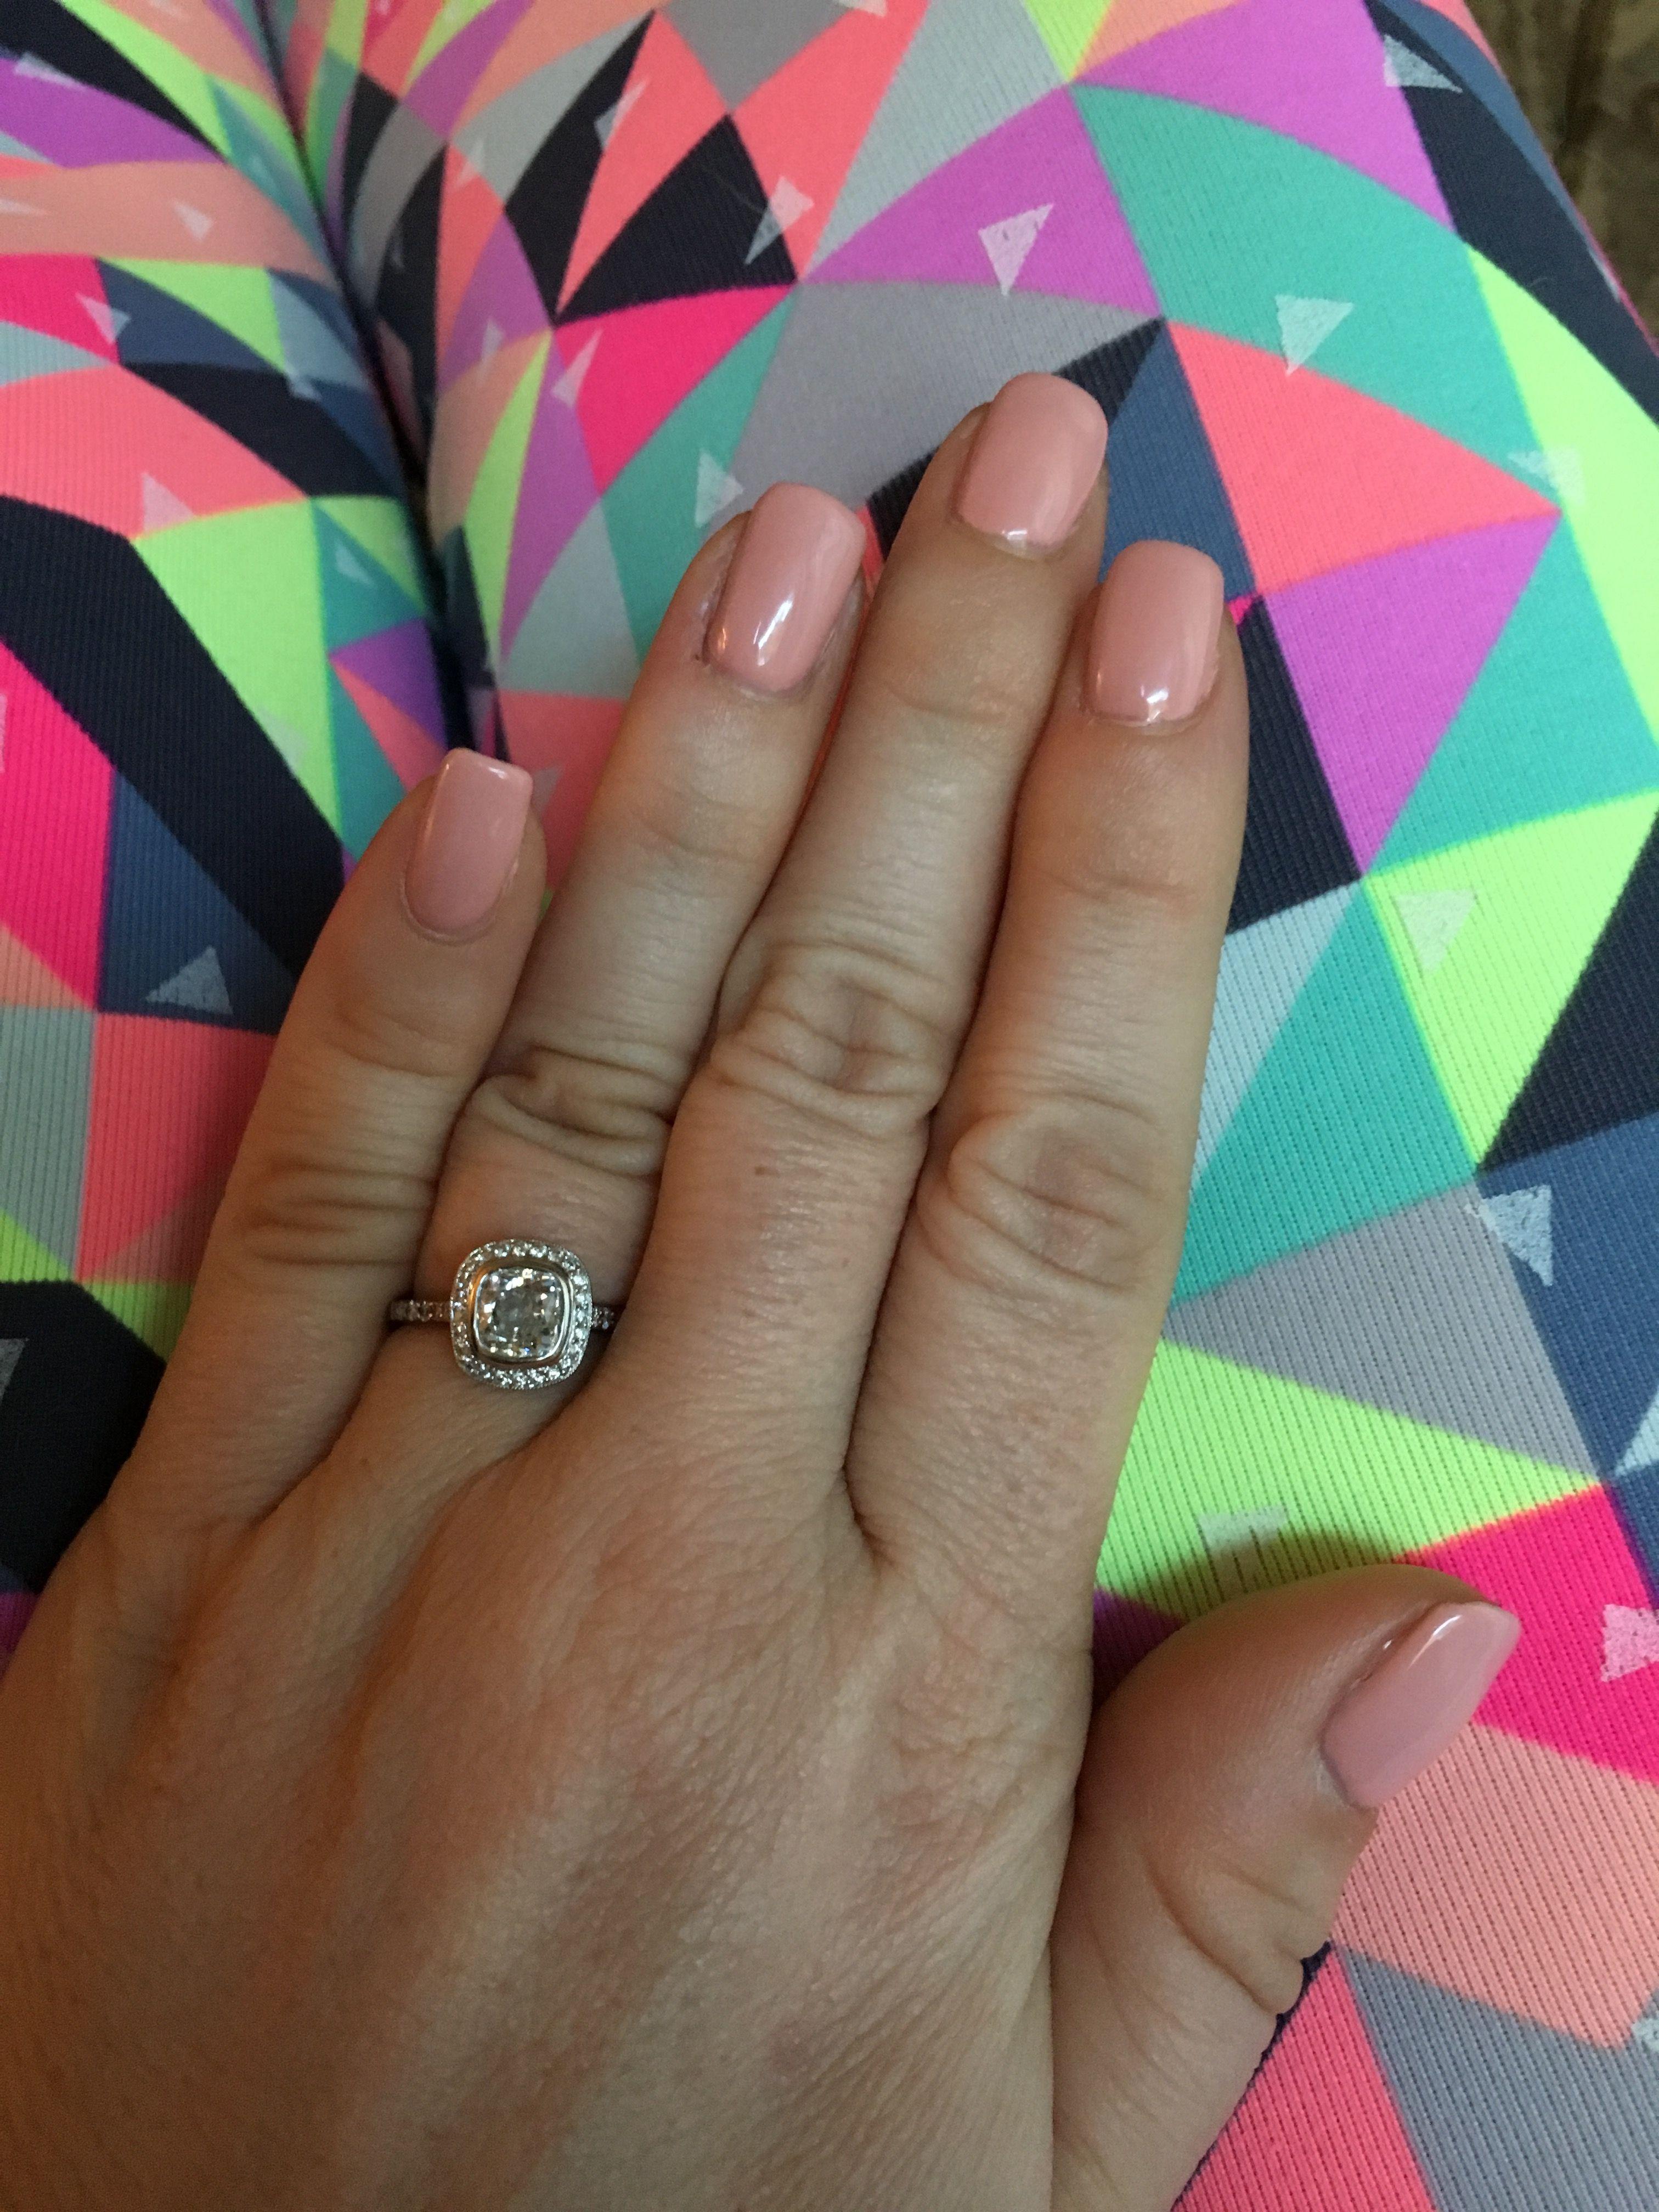 DND Cinnamon Whip gel polish   Pinterest pics   Pinterest